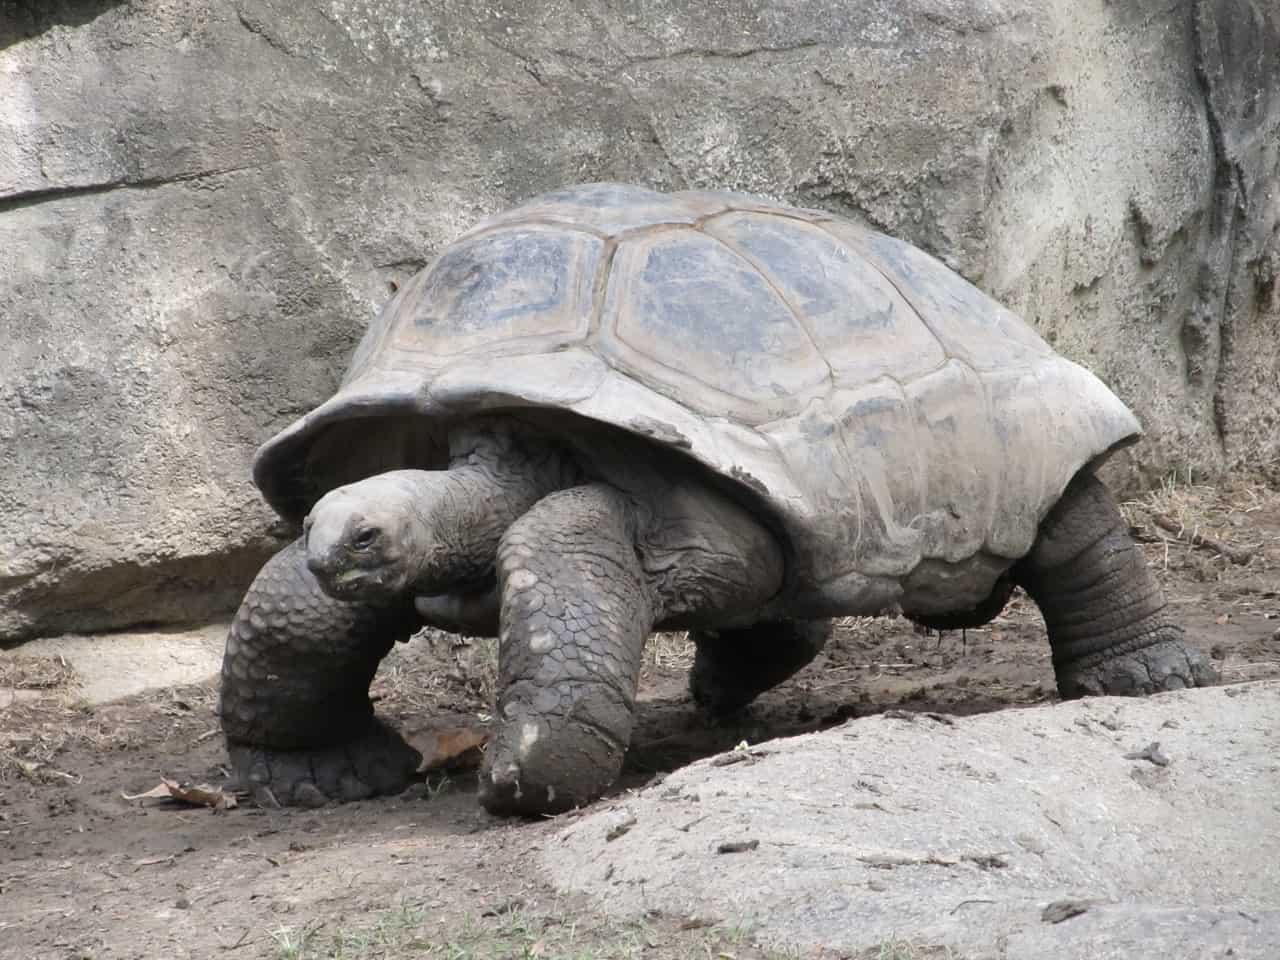 Hare or Tortoise?